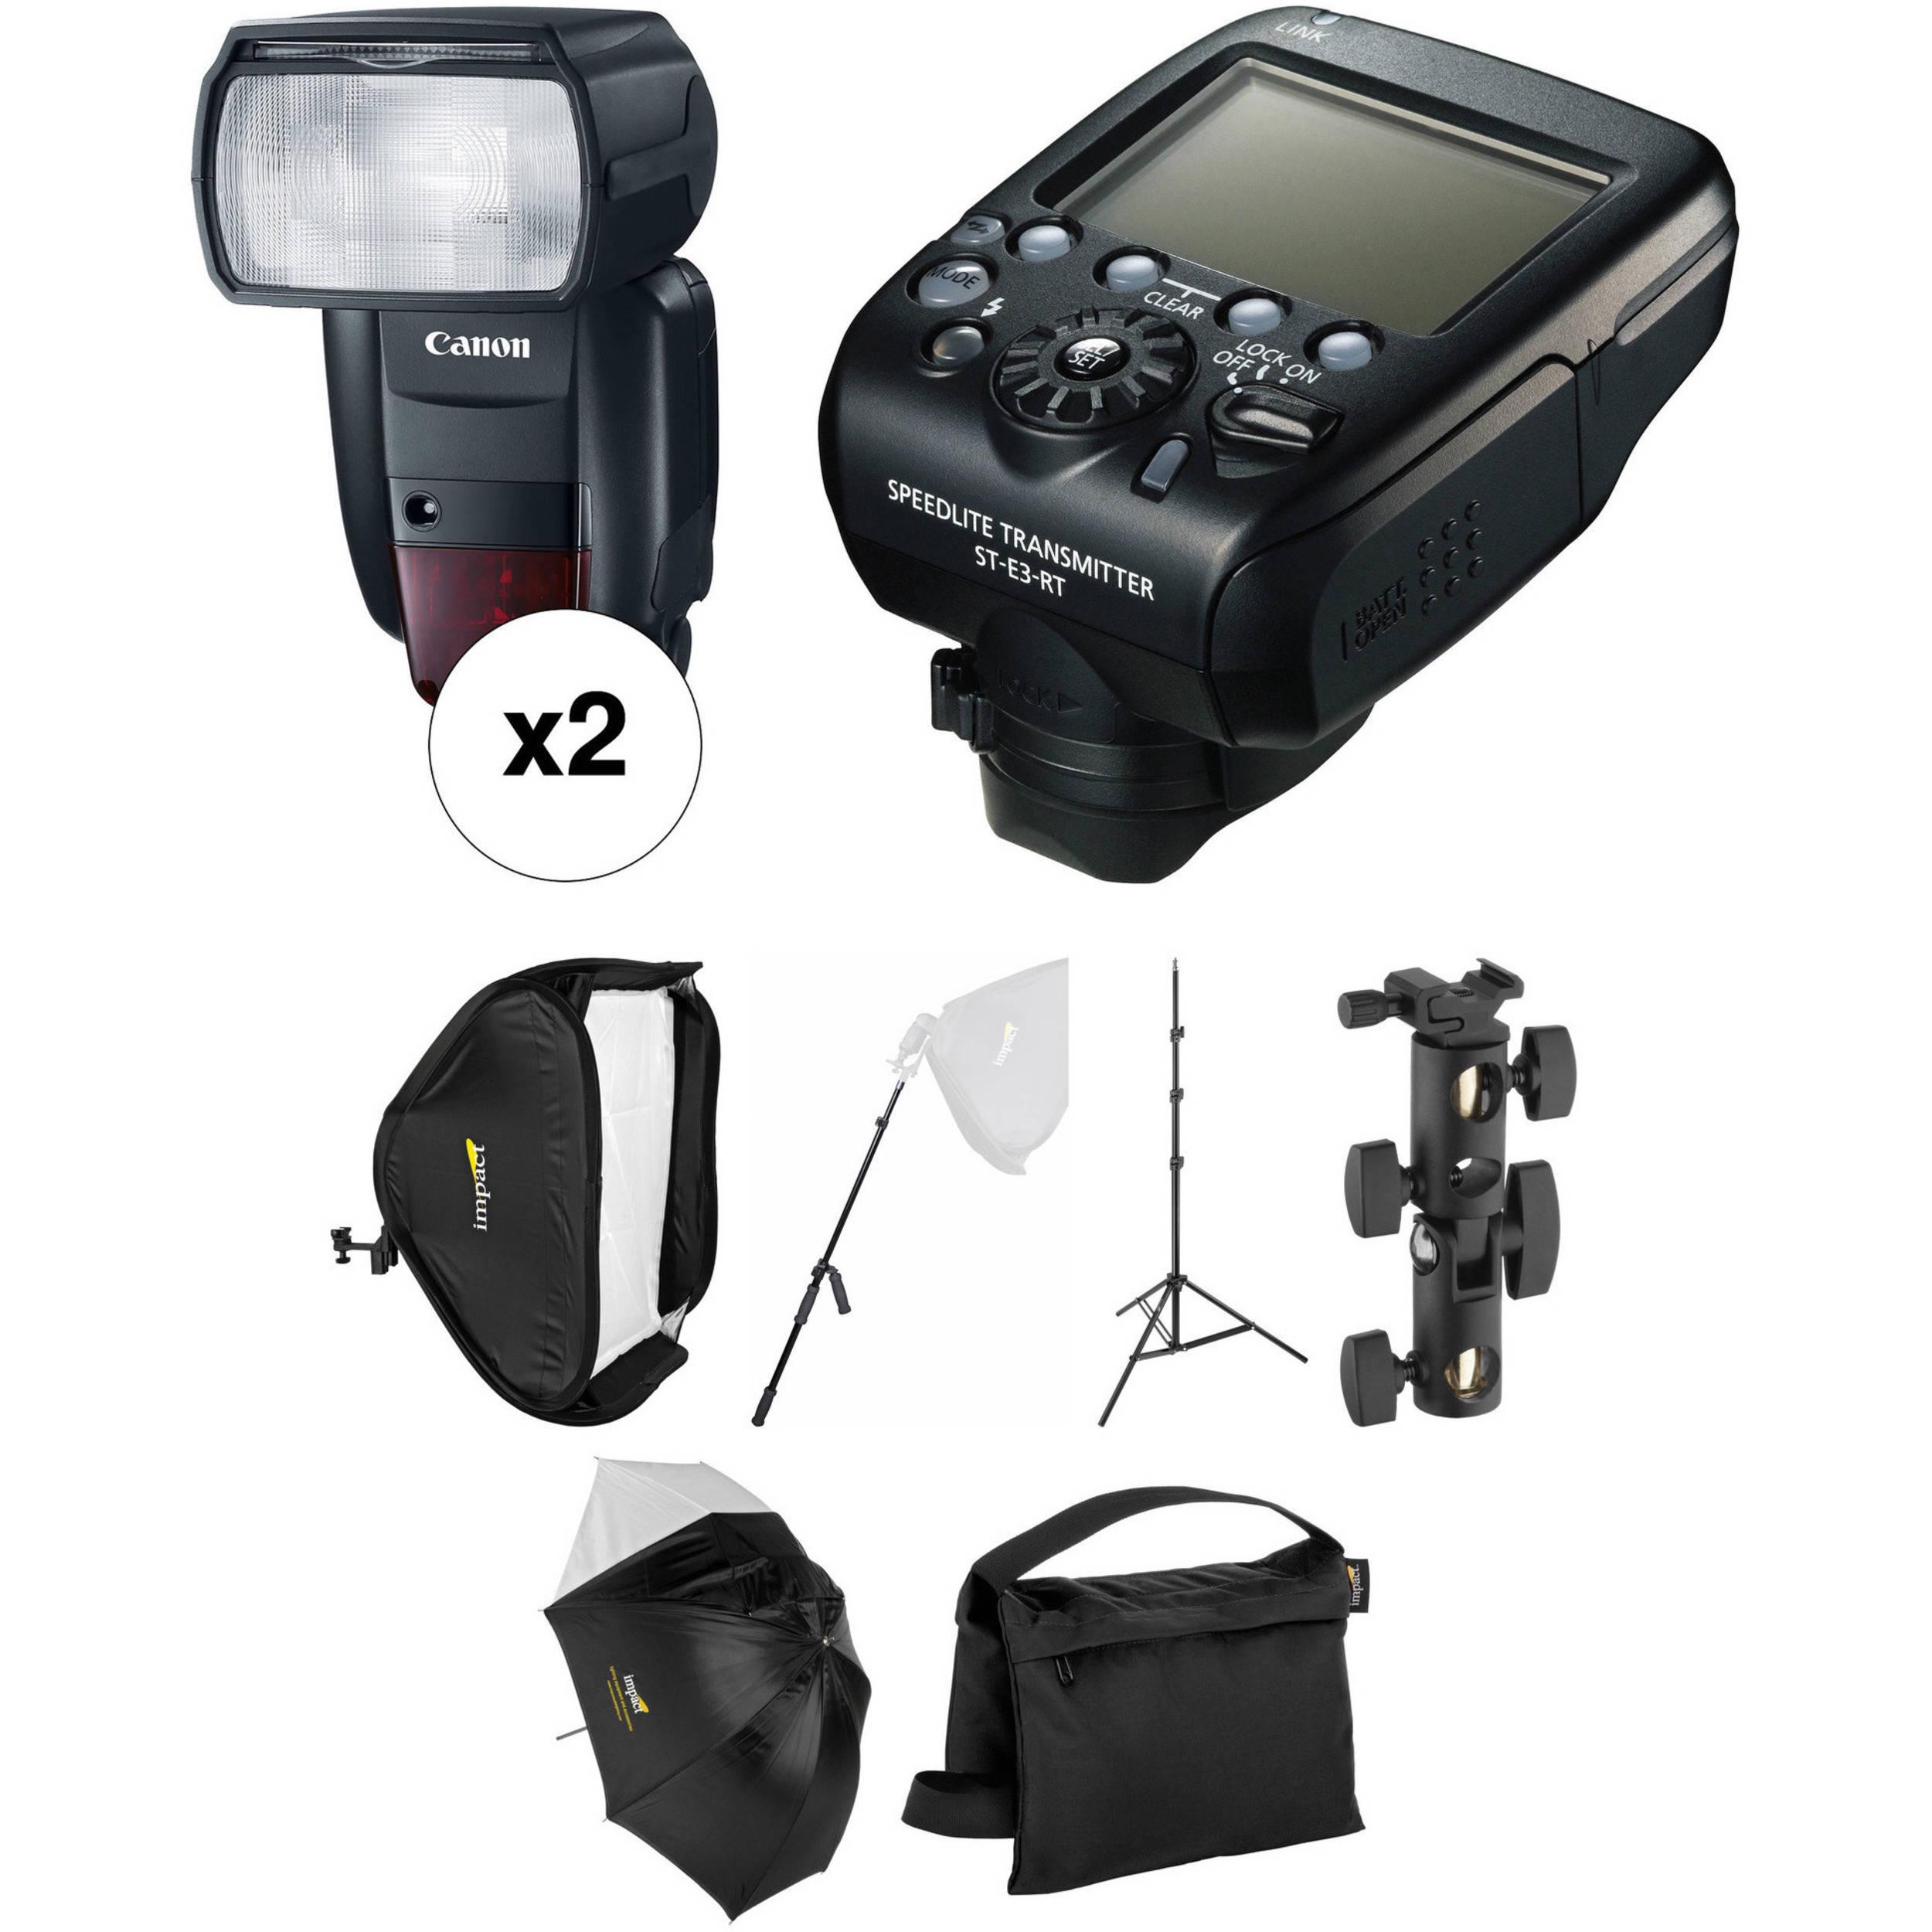 Canon Speedlite 600EX II-RT Wireless Two Flash Location Kit  sc 1 st  Bu0026H & Battery-Powered Strobe Light Kits | Bu0026H Photo Video azcodes.com